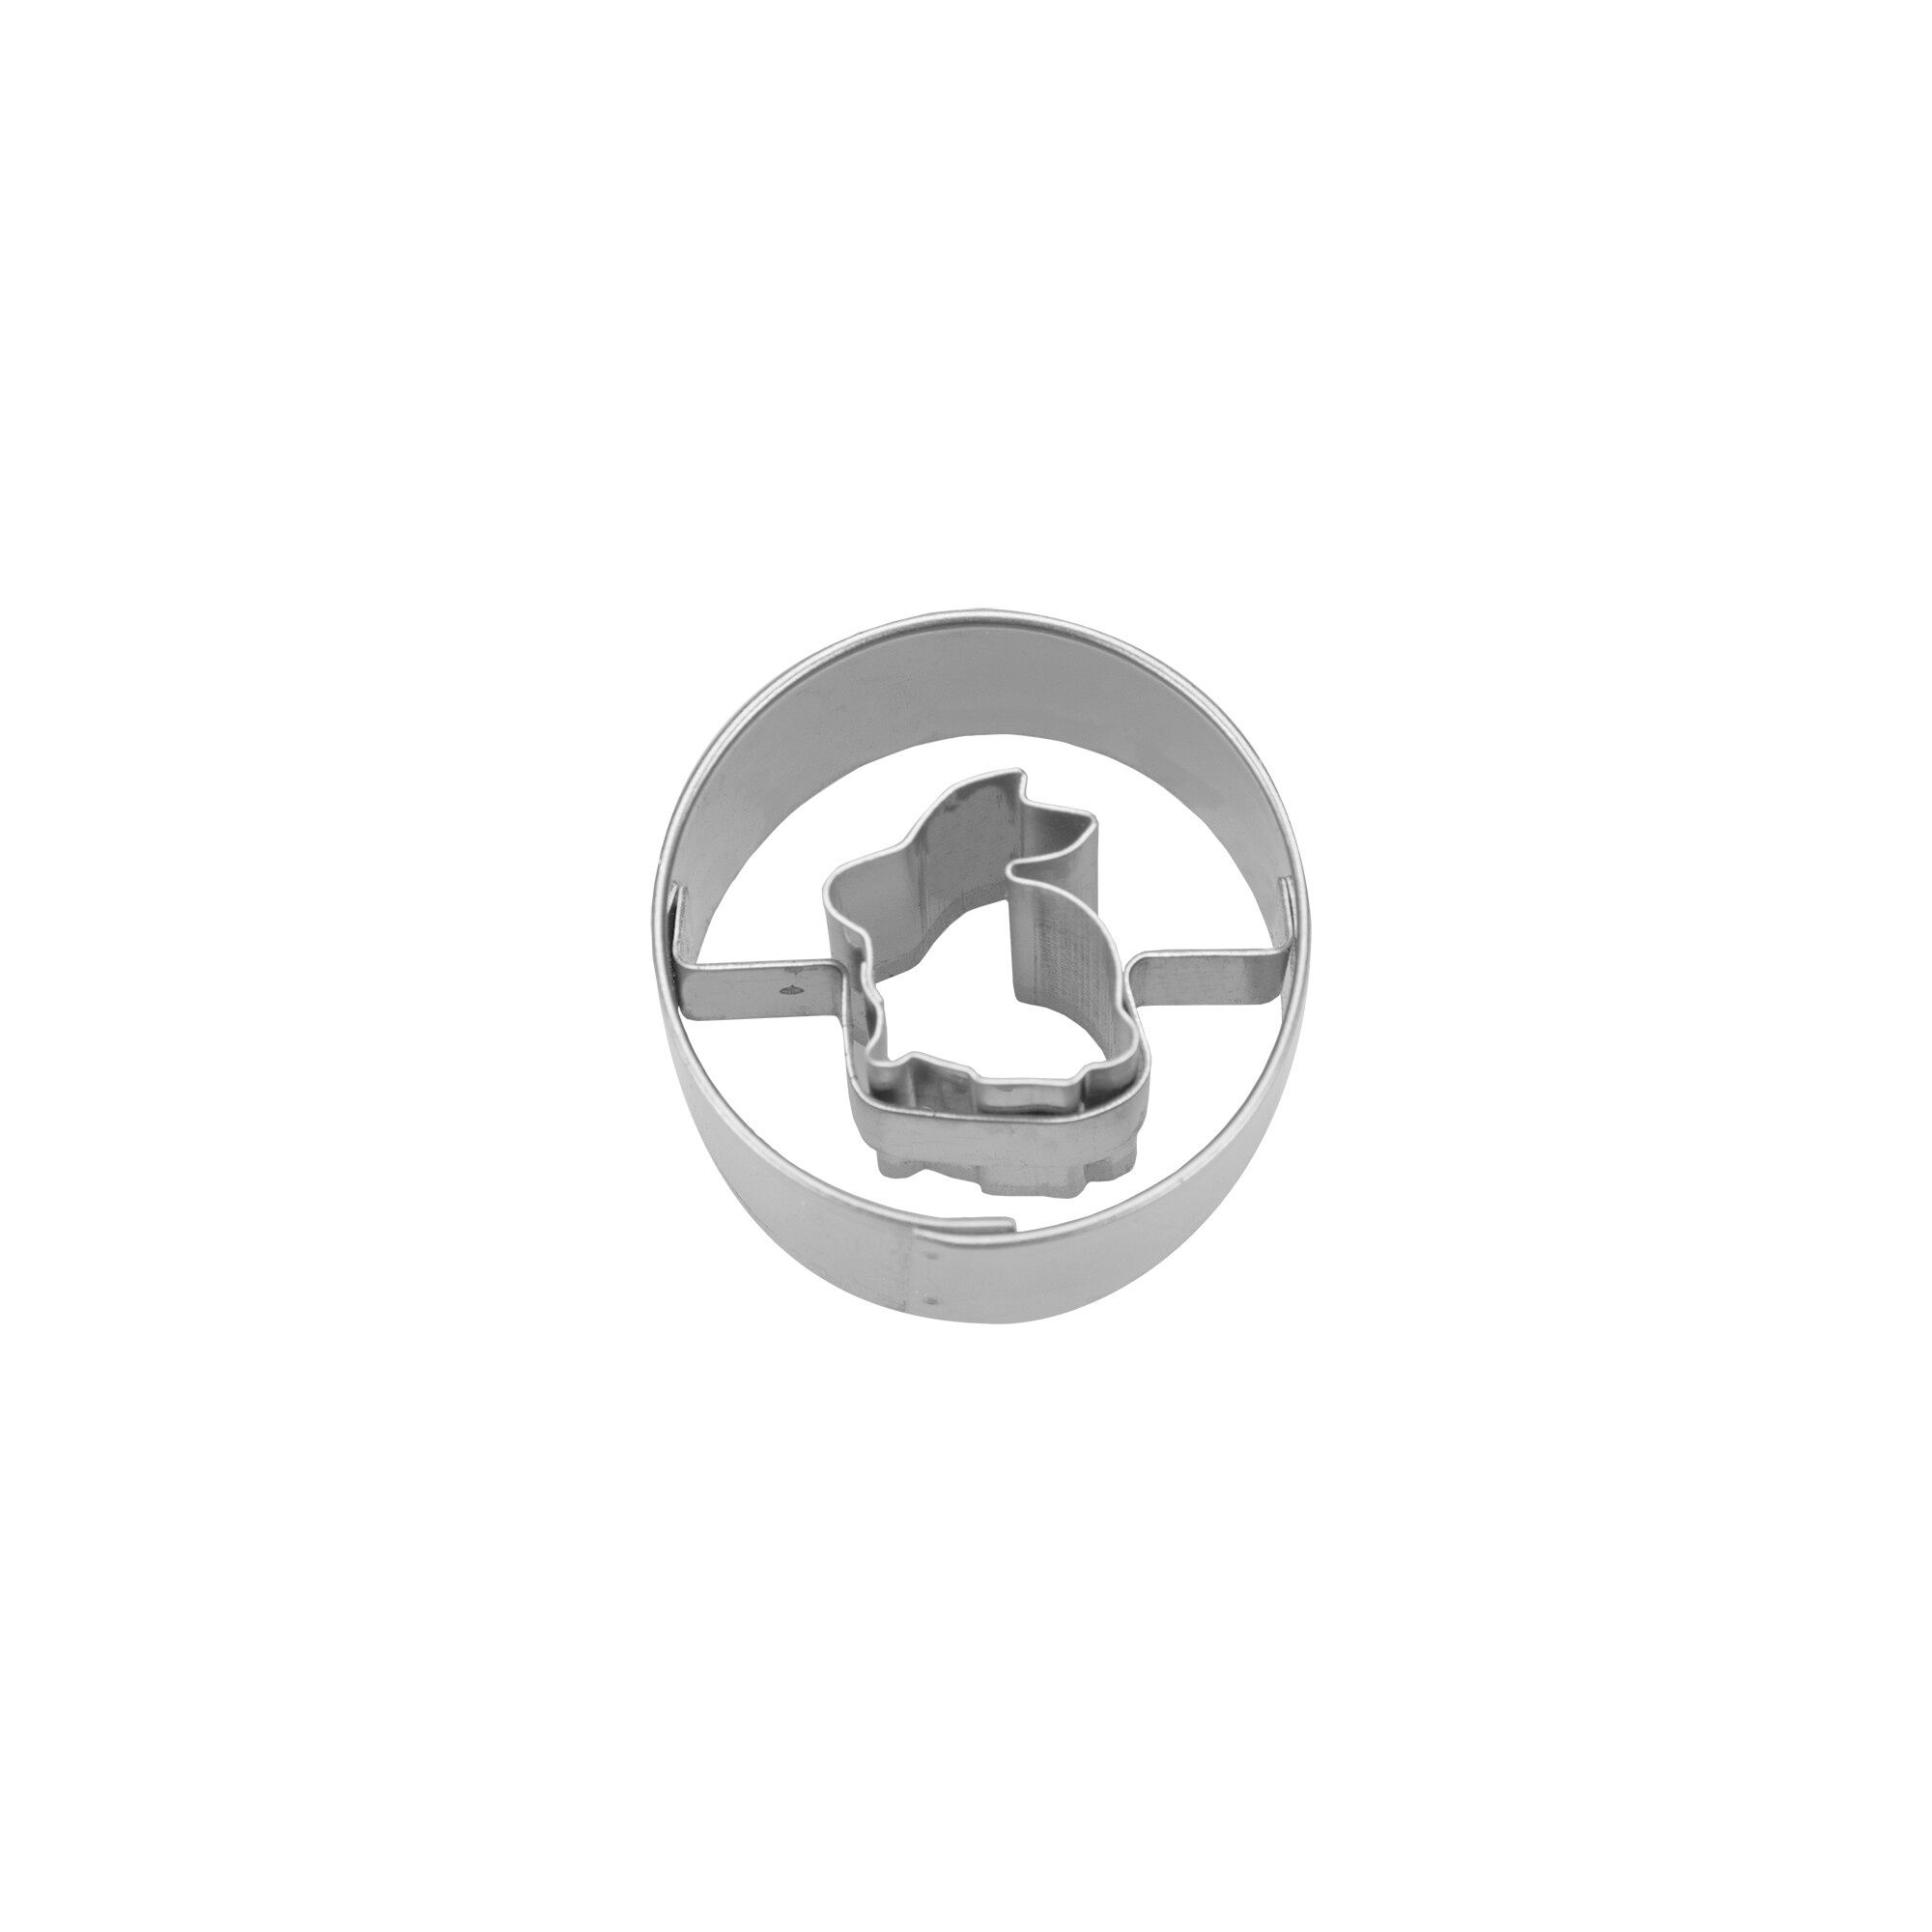 Ausstecher - Hase sitzend in Ring - Mini